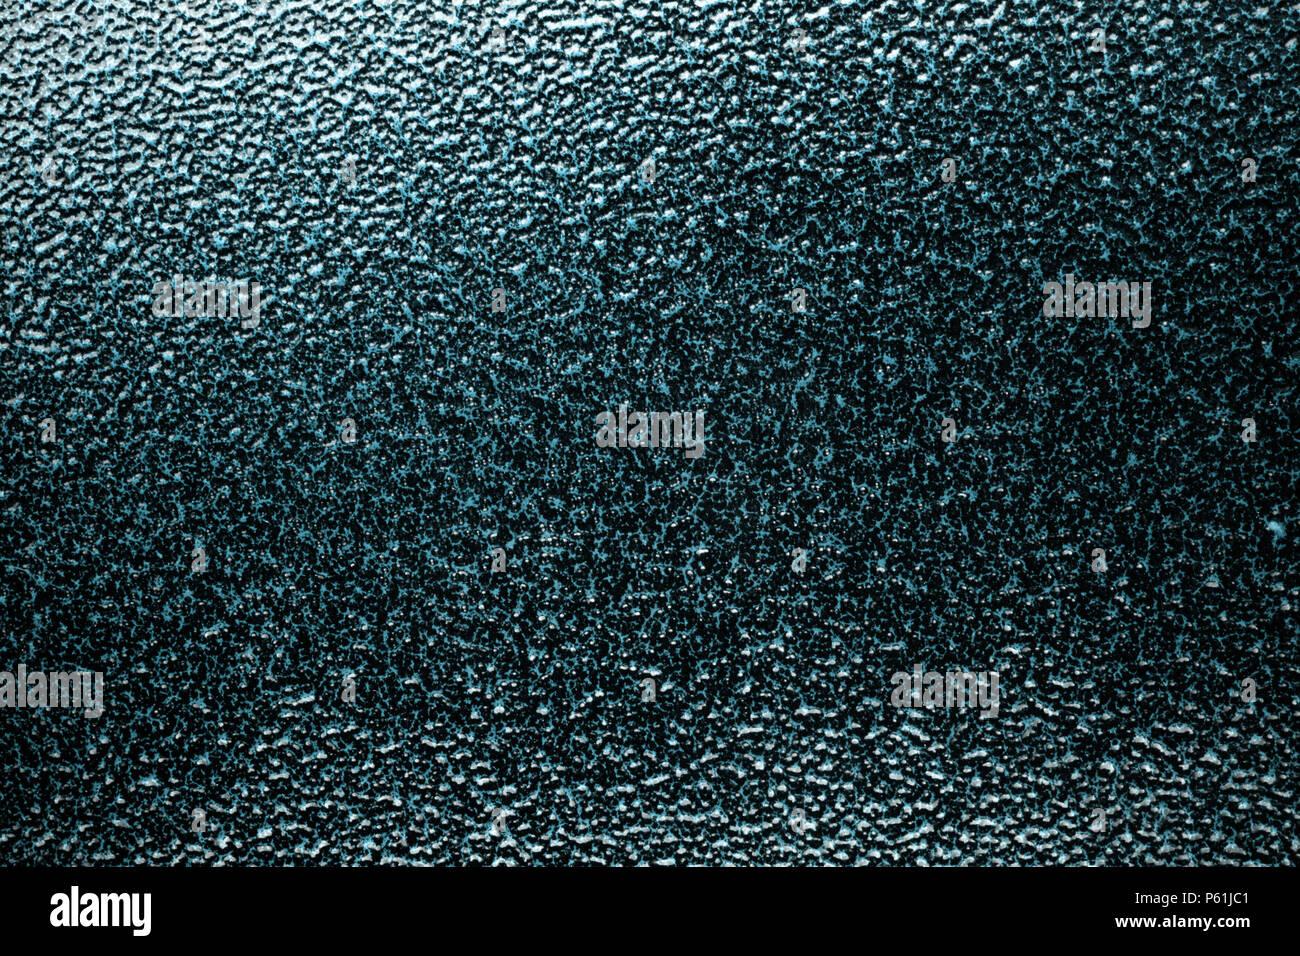 close up shot of shiny metal surface. - Stock Image